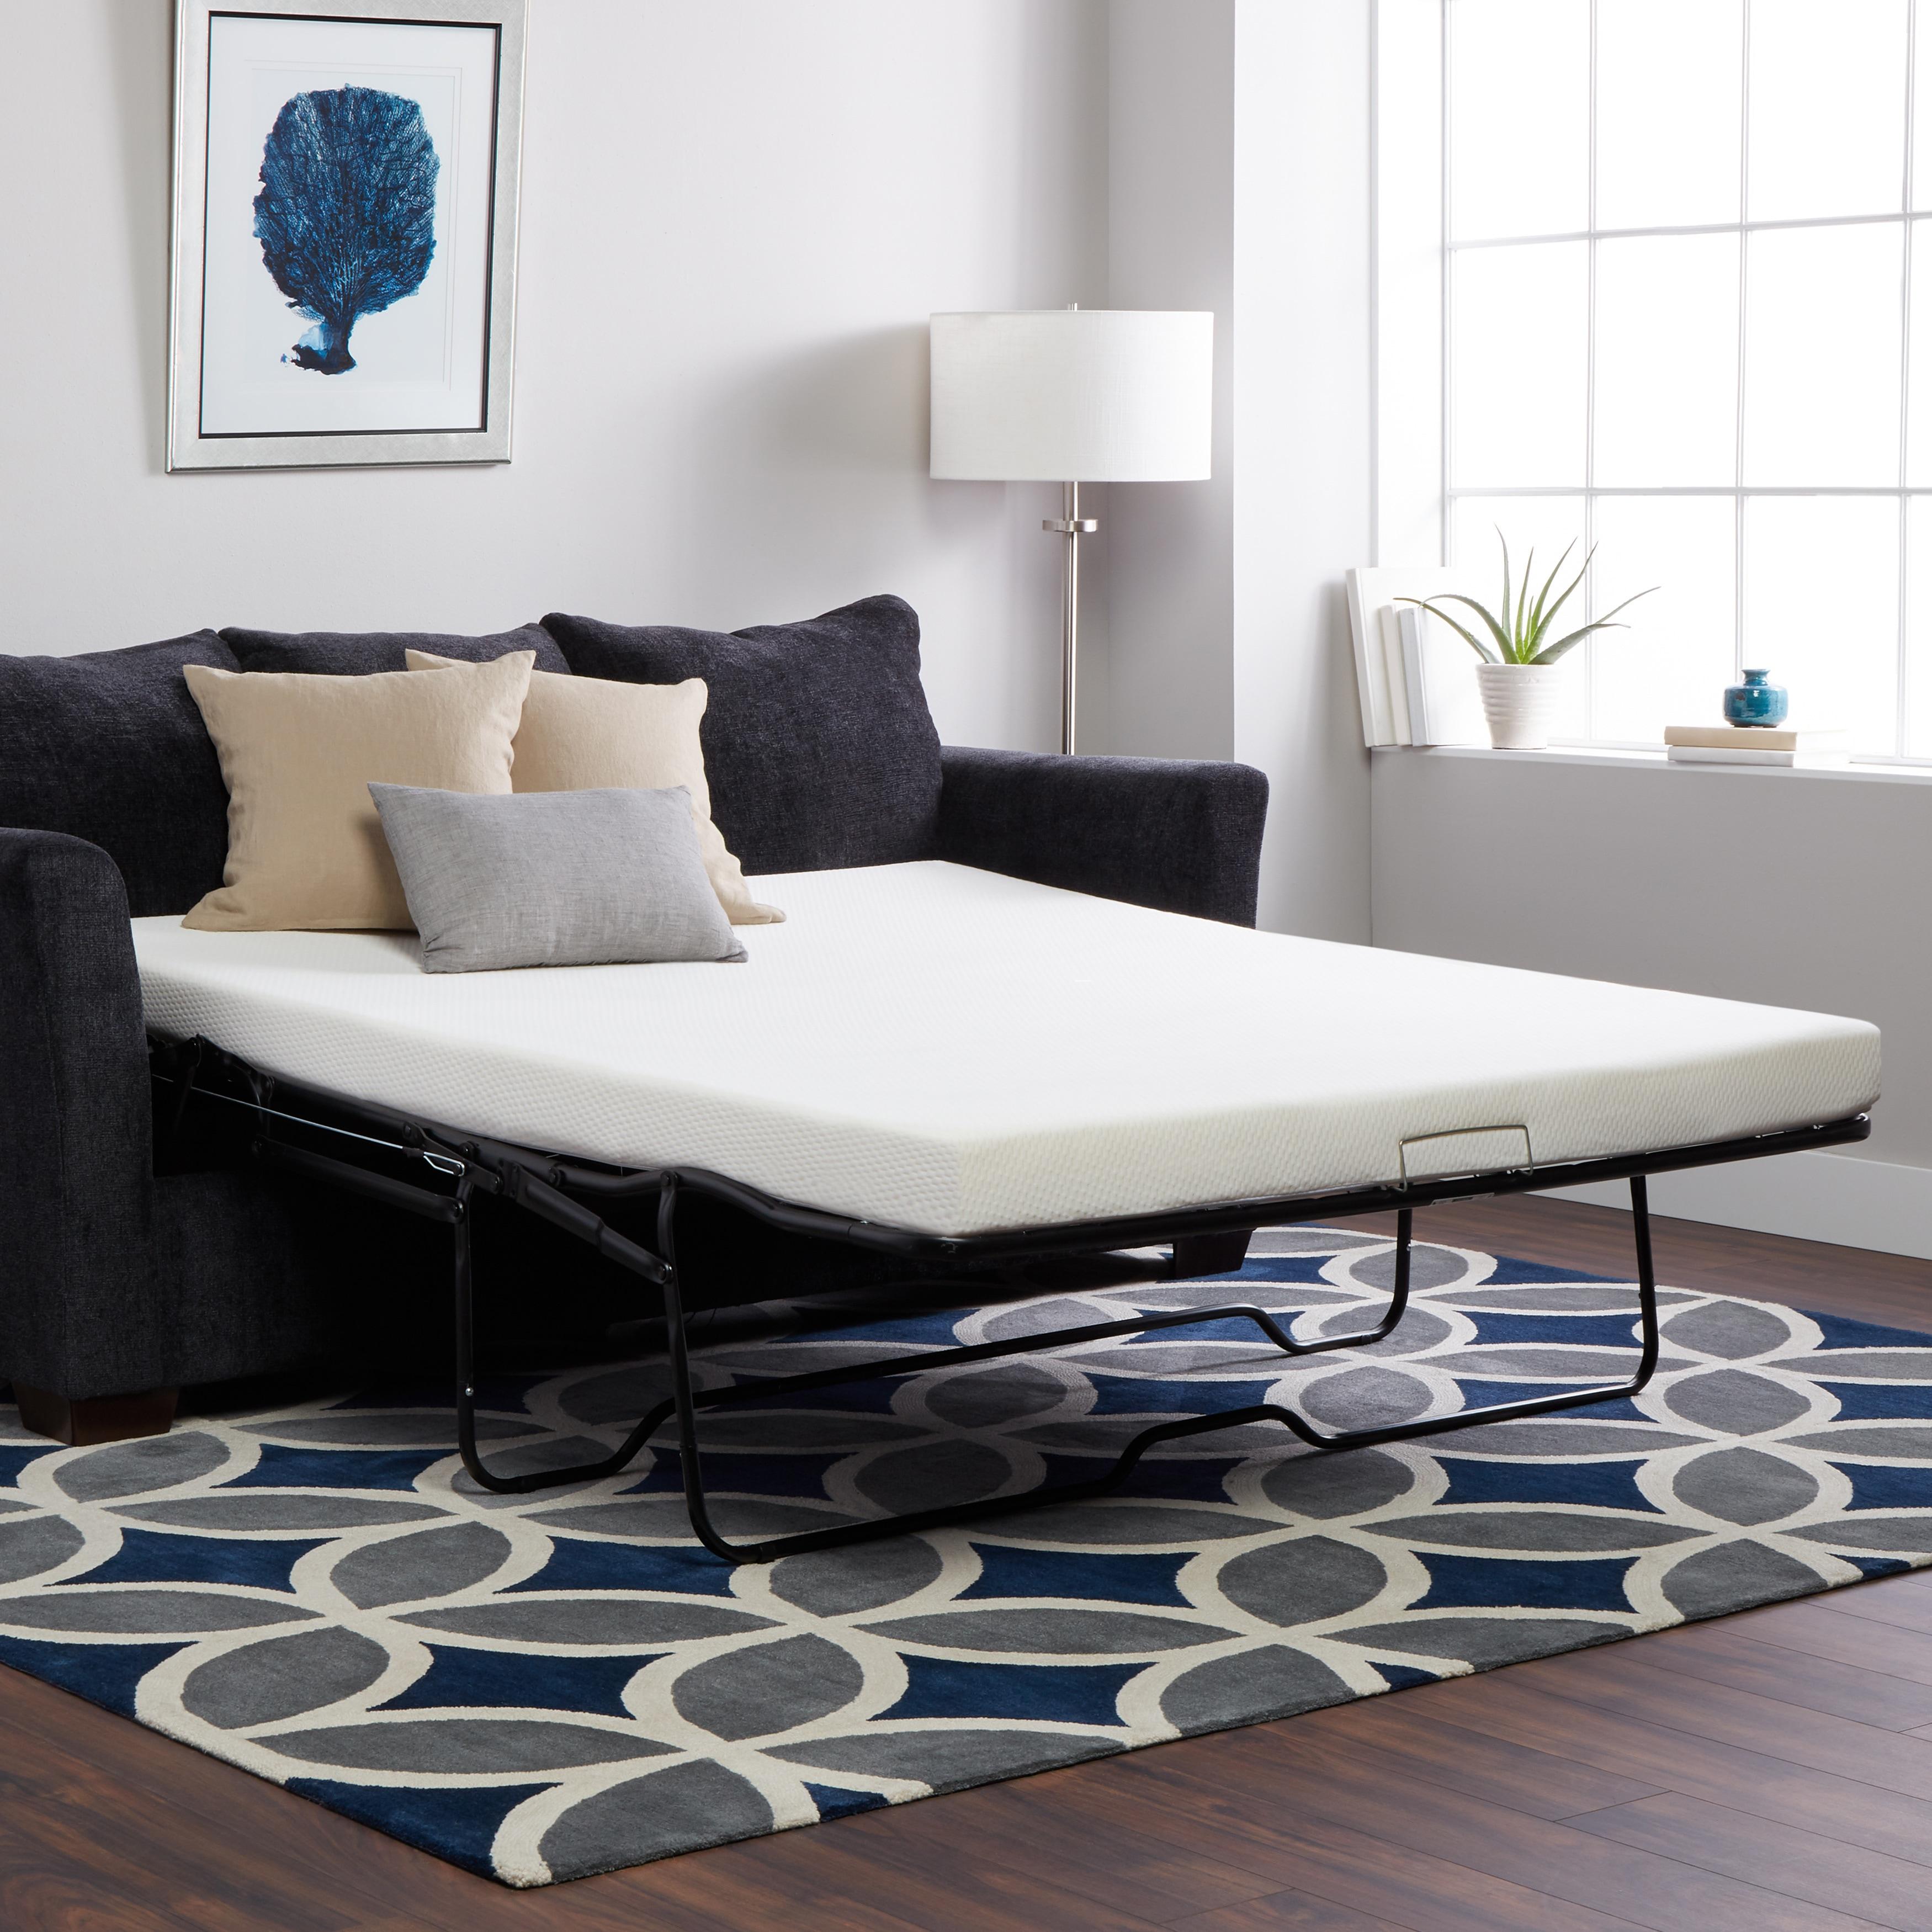 Select Luxury New Life 4.5-inch Twin-size Memory Foam Sof...